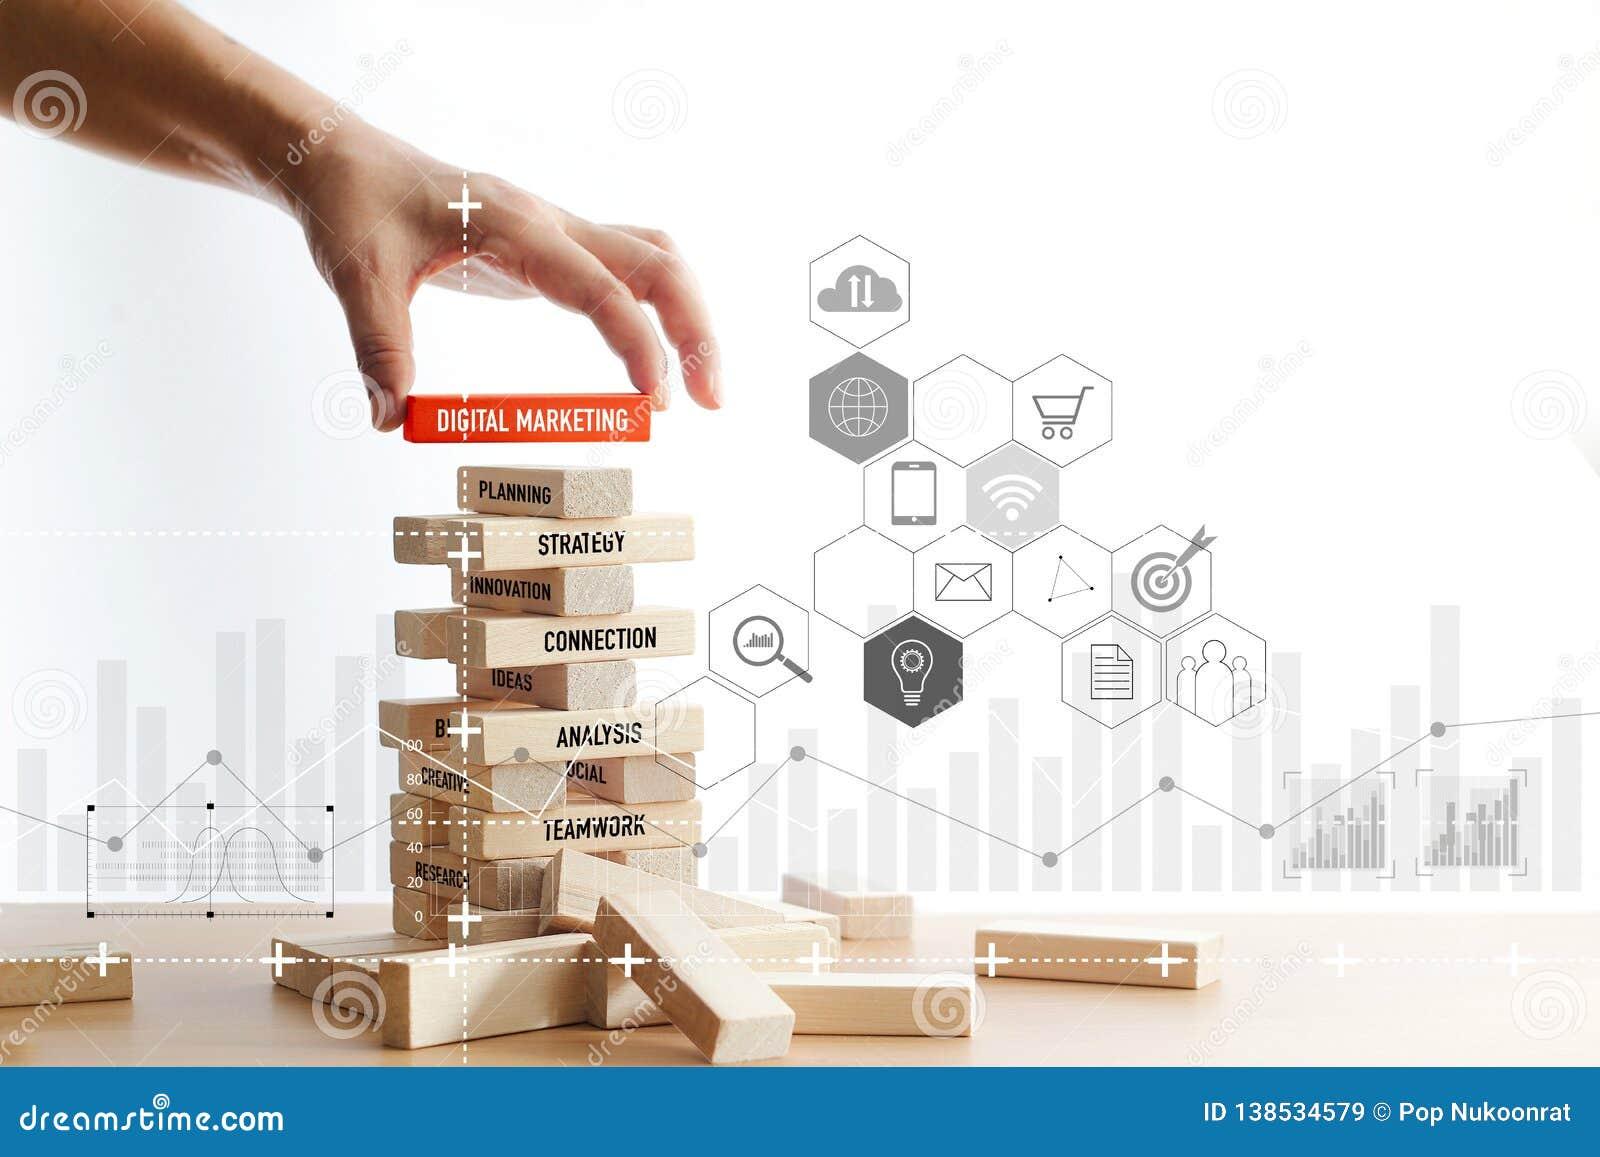 Digital marketing concept. Hand holding wooden block with digital marketing word